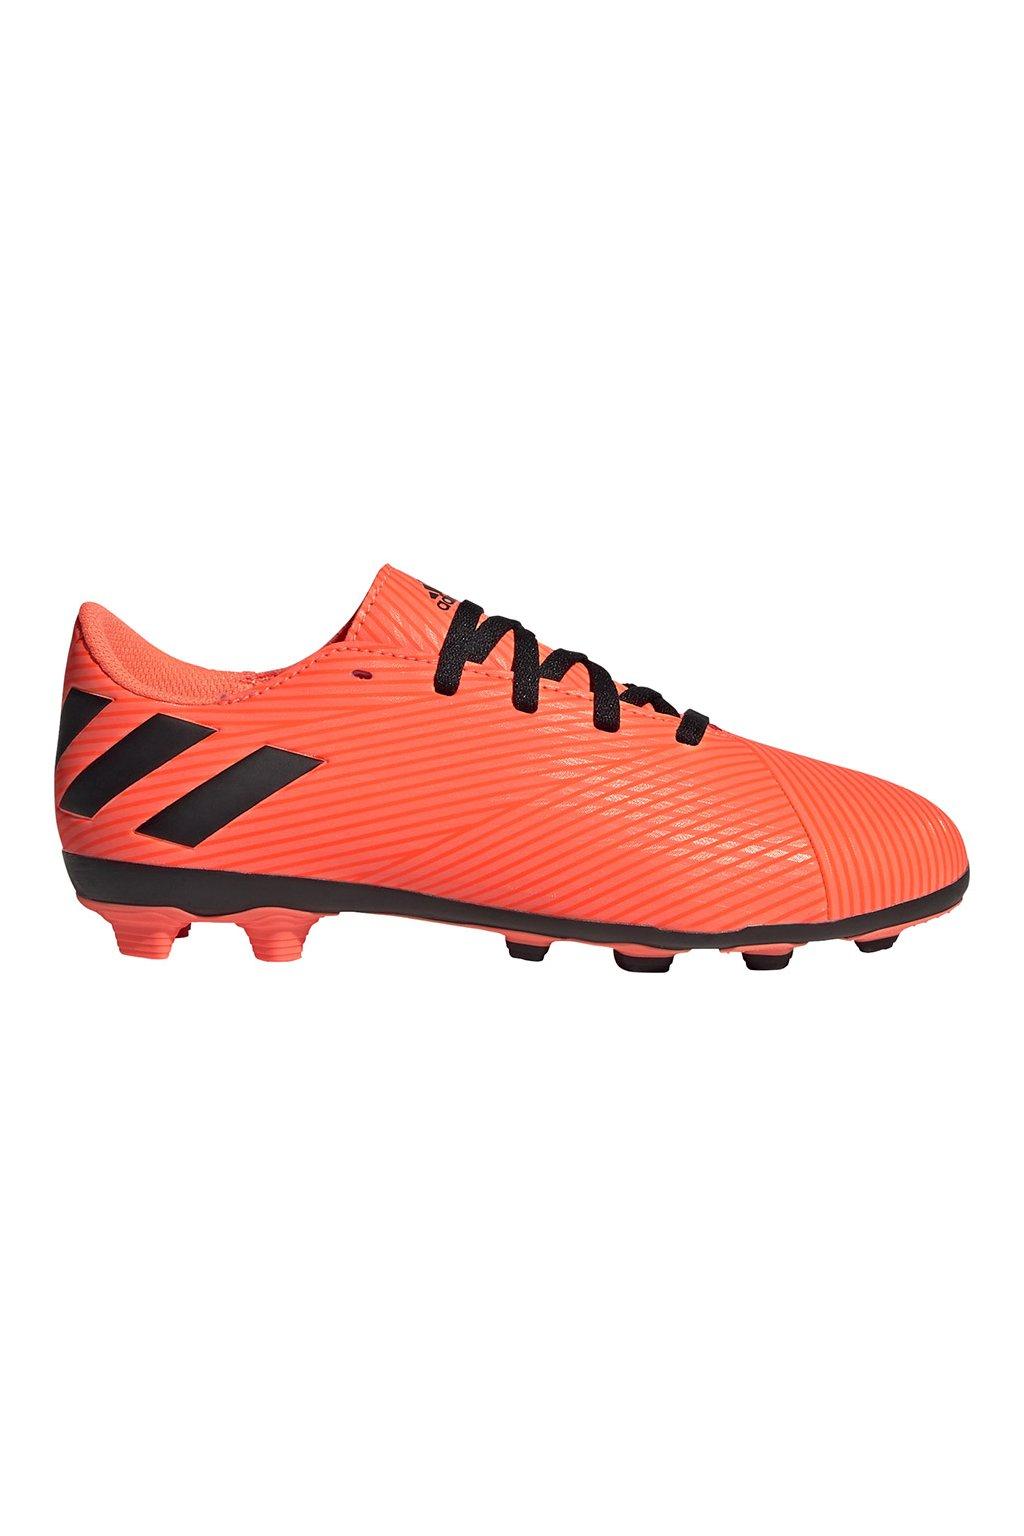 Futbalové kopačky Adidas Nemeziz 19.4 FxG JR oranžové EH0507